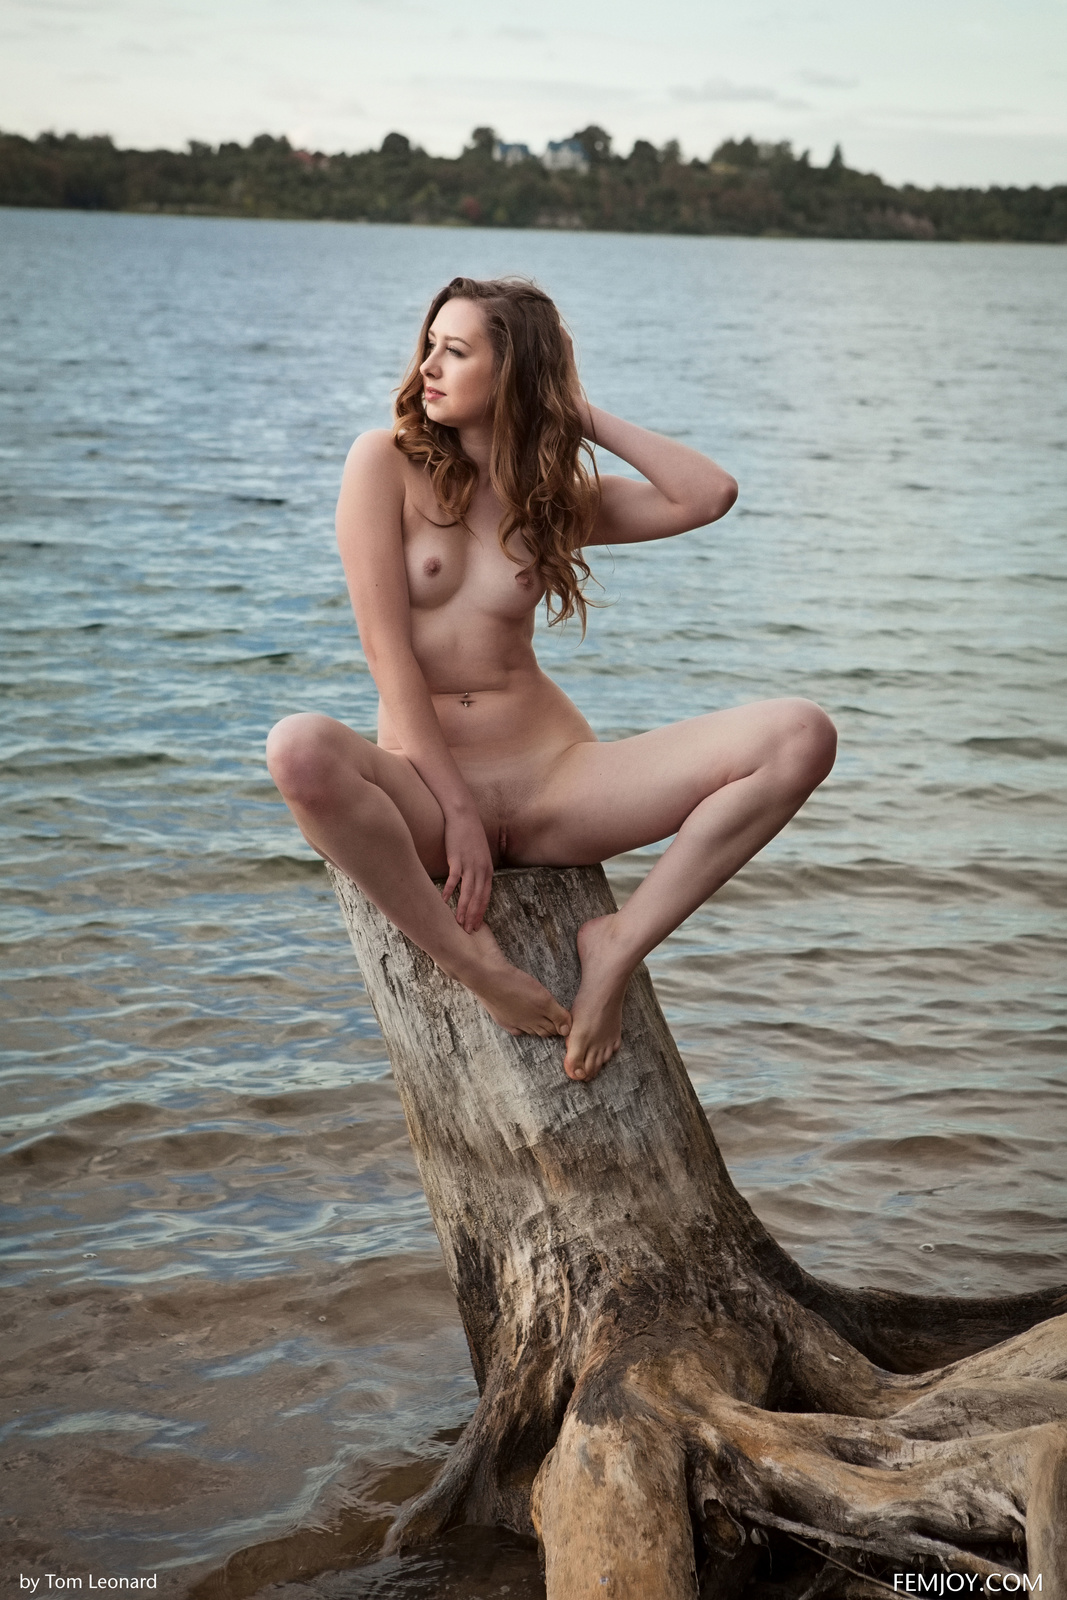 Zdjęcie porno - 054 - Zgrabna i naga laska nad jeziorkiem